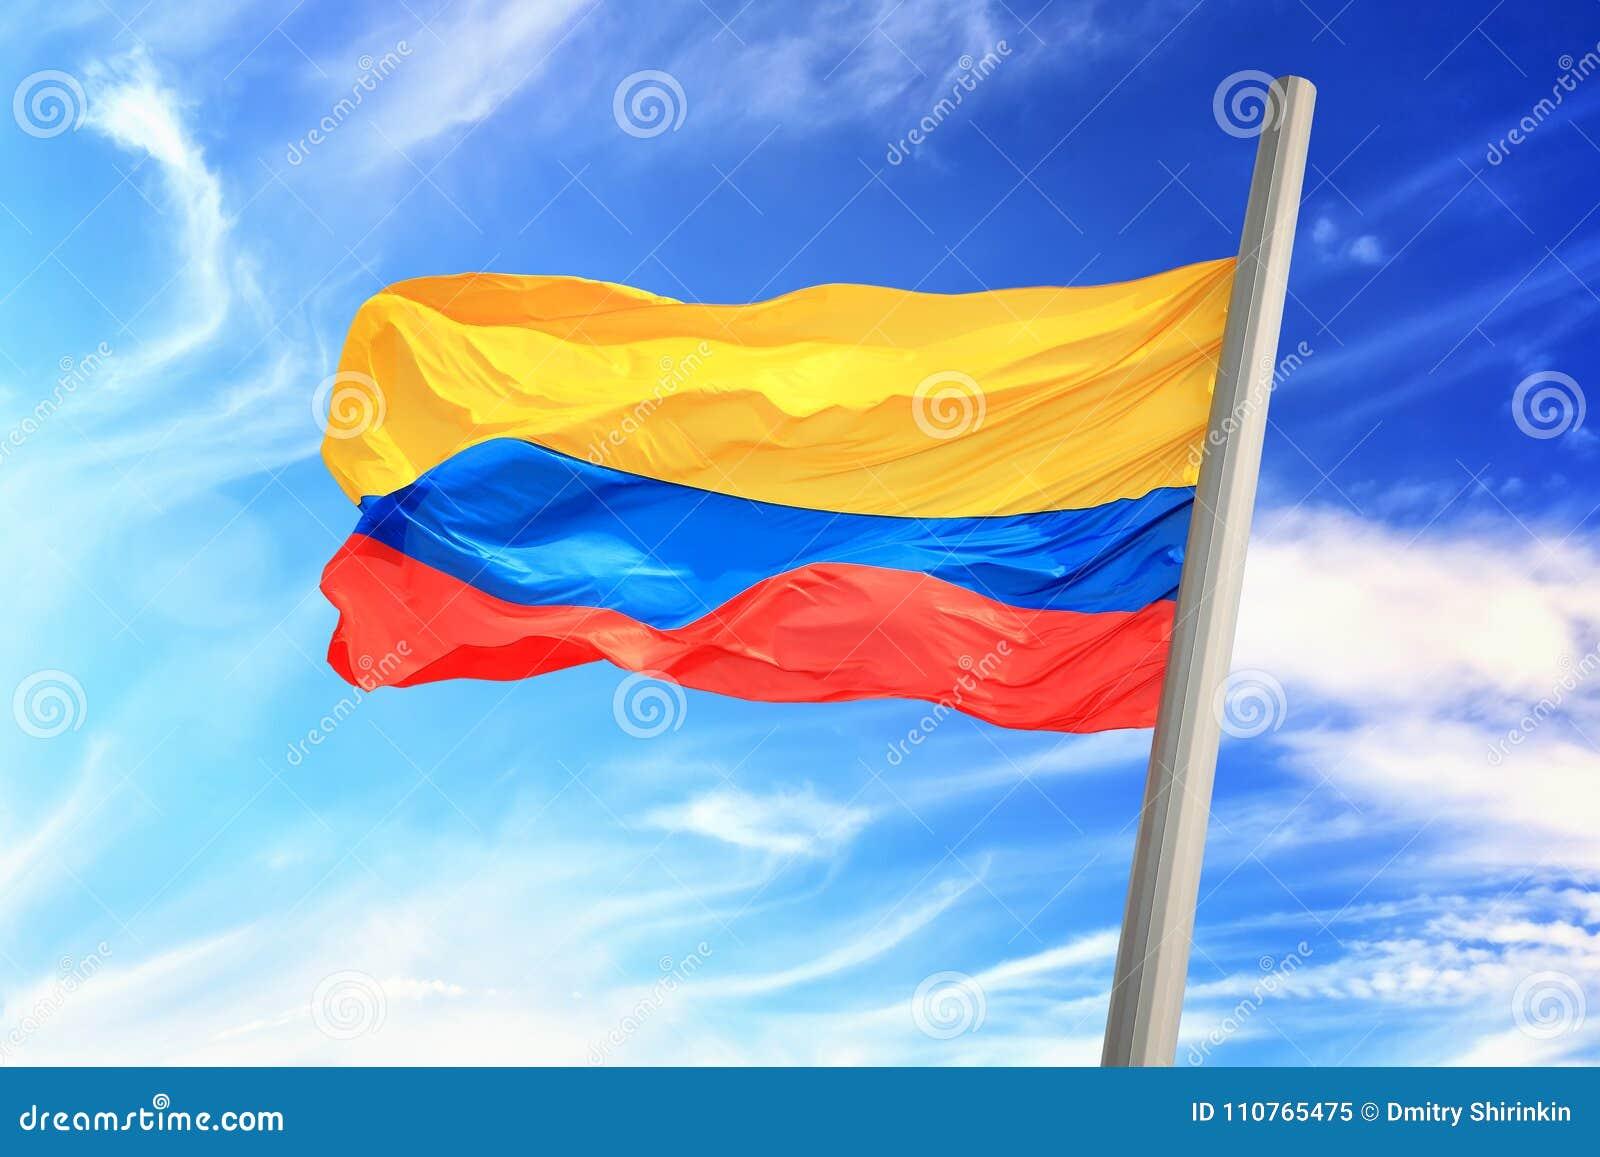 Colombian Flag Stock Image Image Of Symbolic Sign 110765475